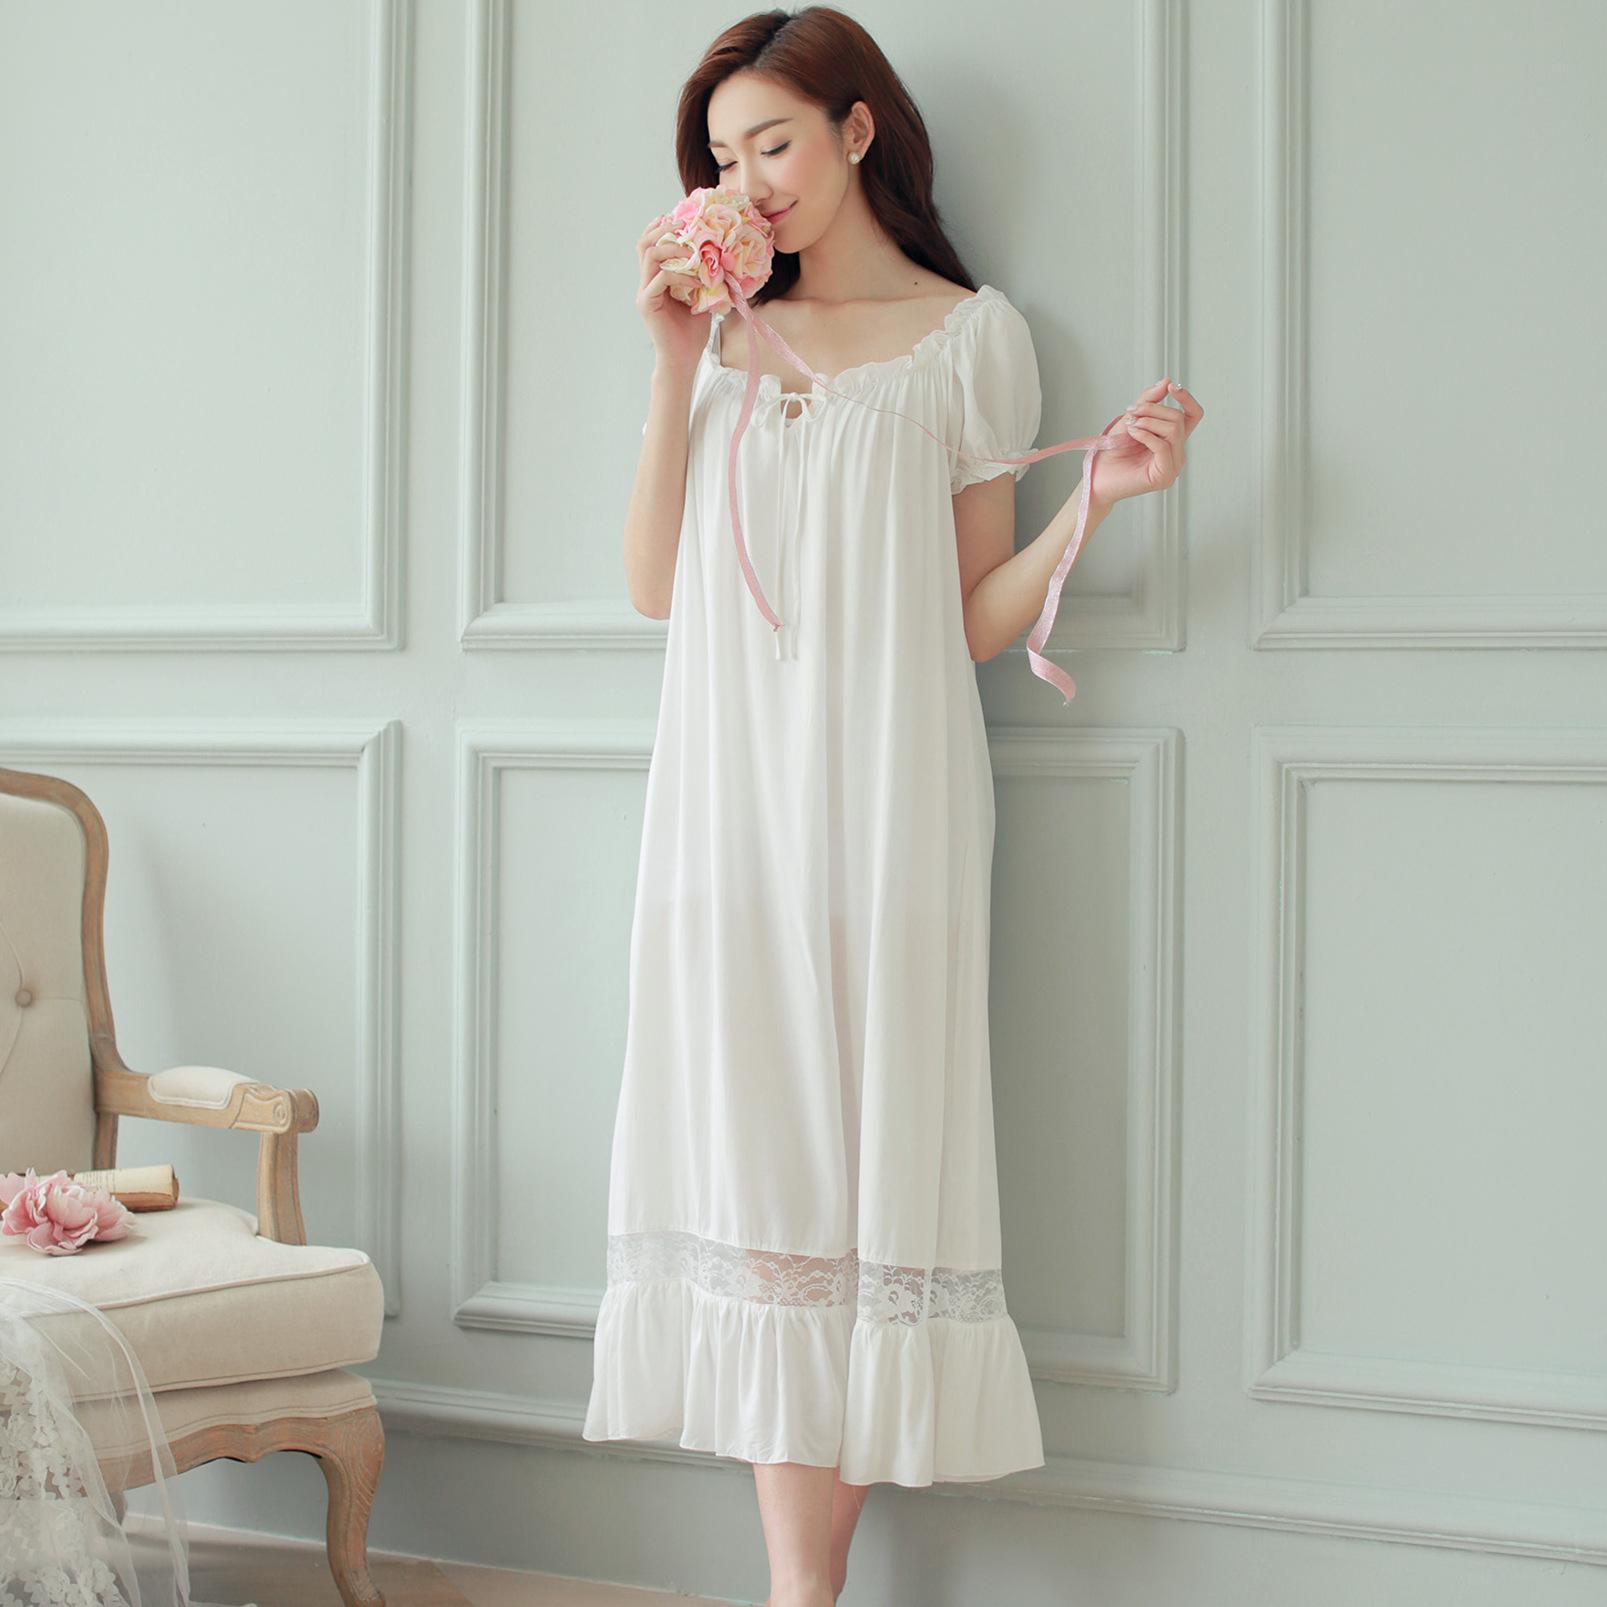 Night dress long white nightgown Women Nightgowns Cotton Short sexy ... 4fba42417d53